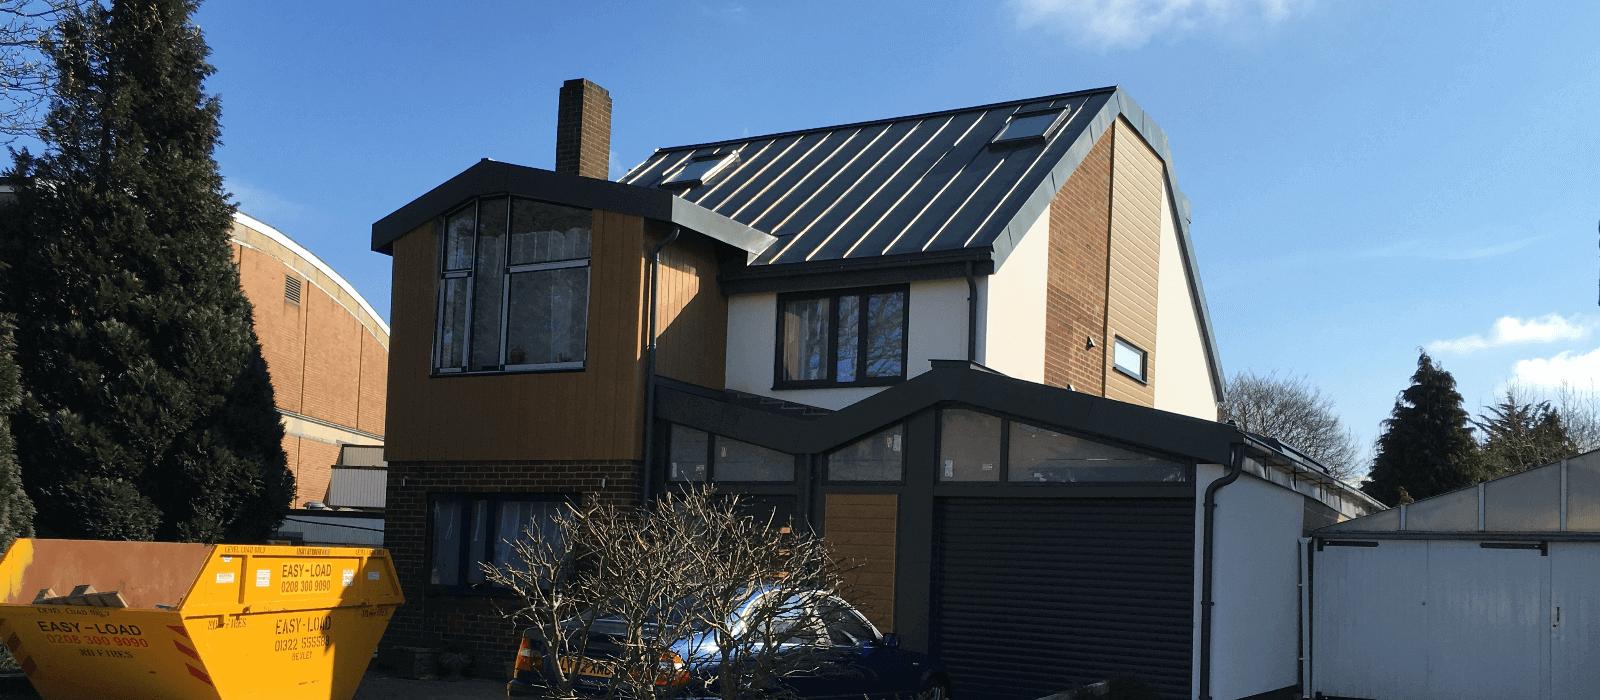 Zinc Roofing In Surrey Sussex London Kent Eco Roofing